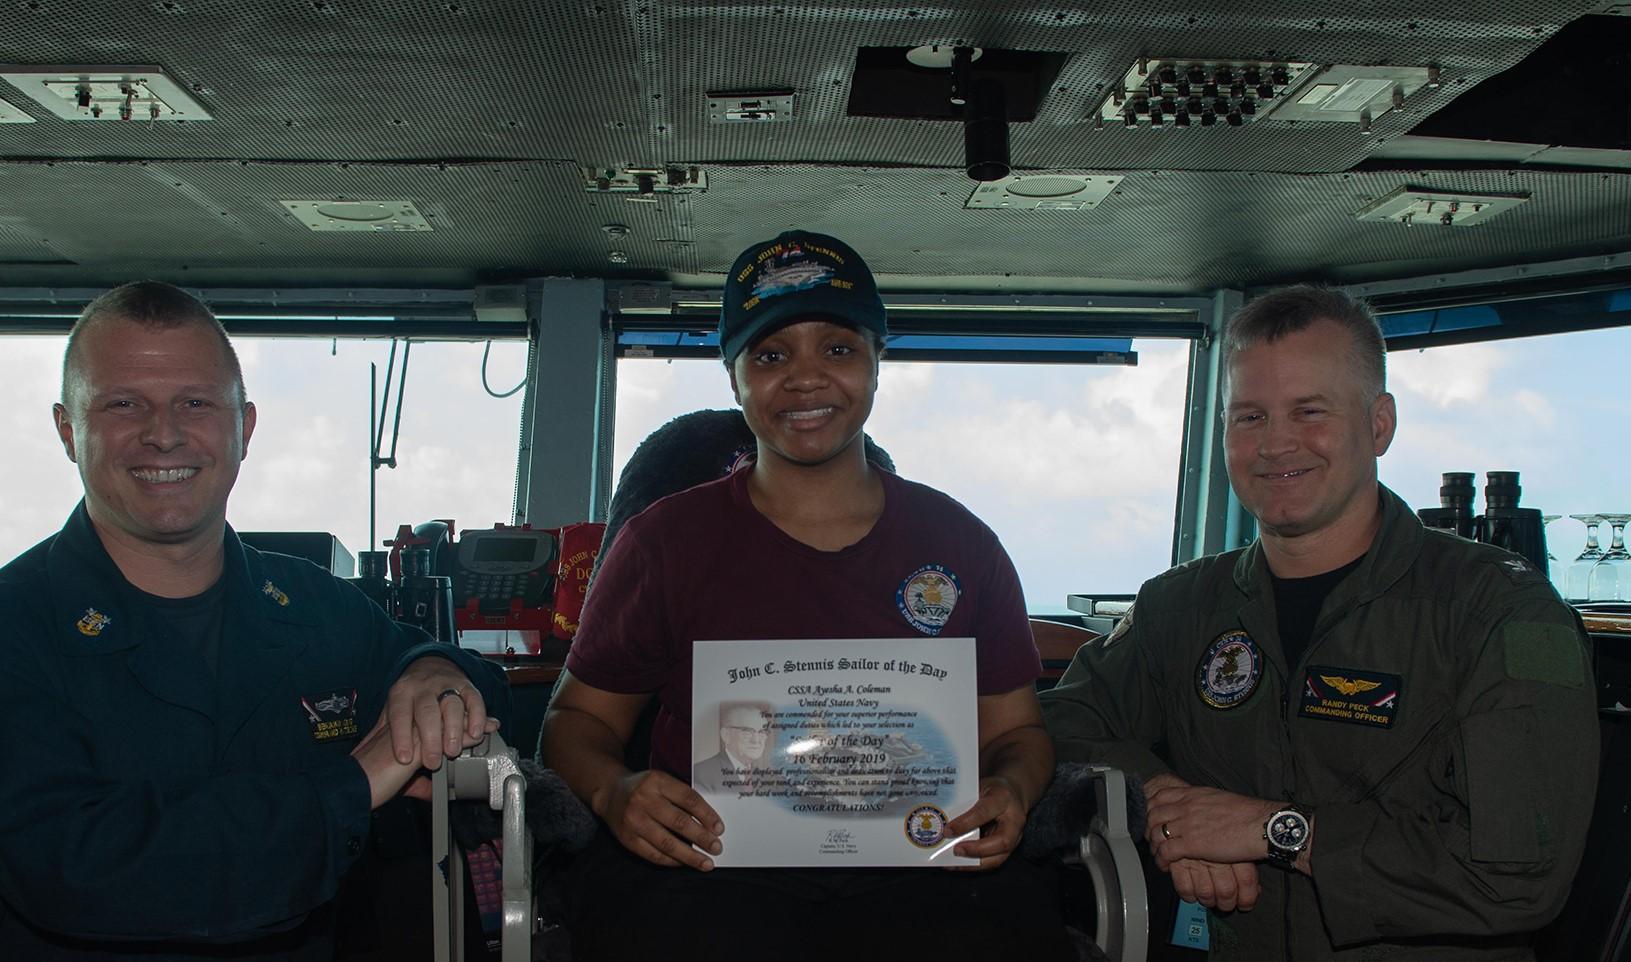 US Navy, sailor of the Day, Ayesha Coleman, USS John C. Stennis